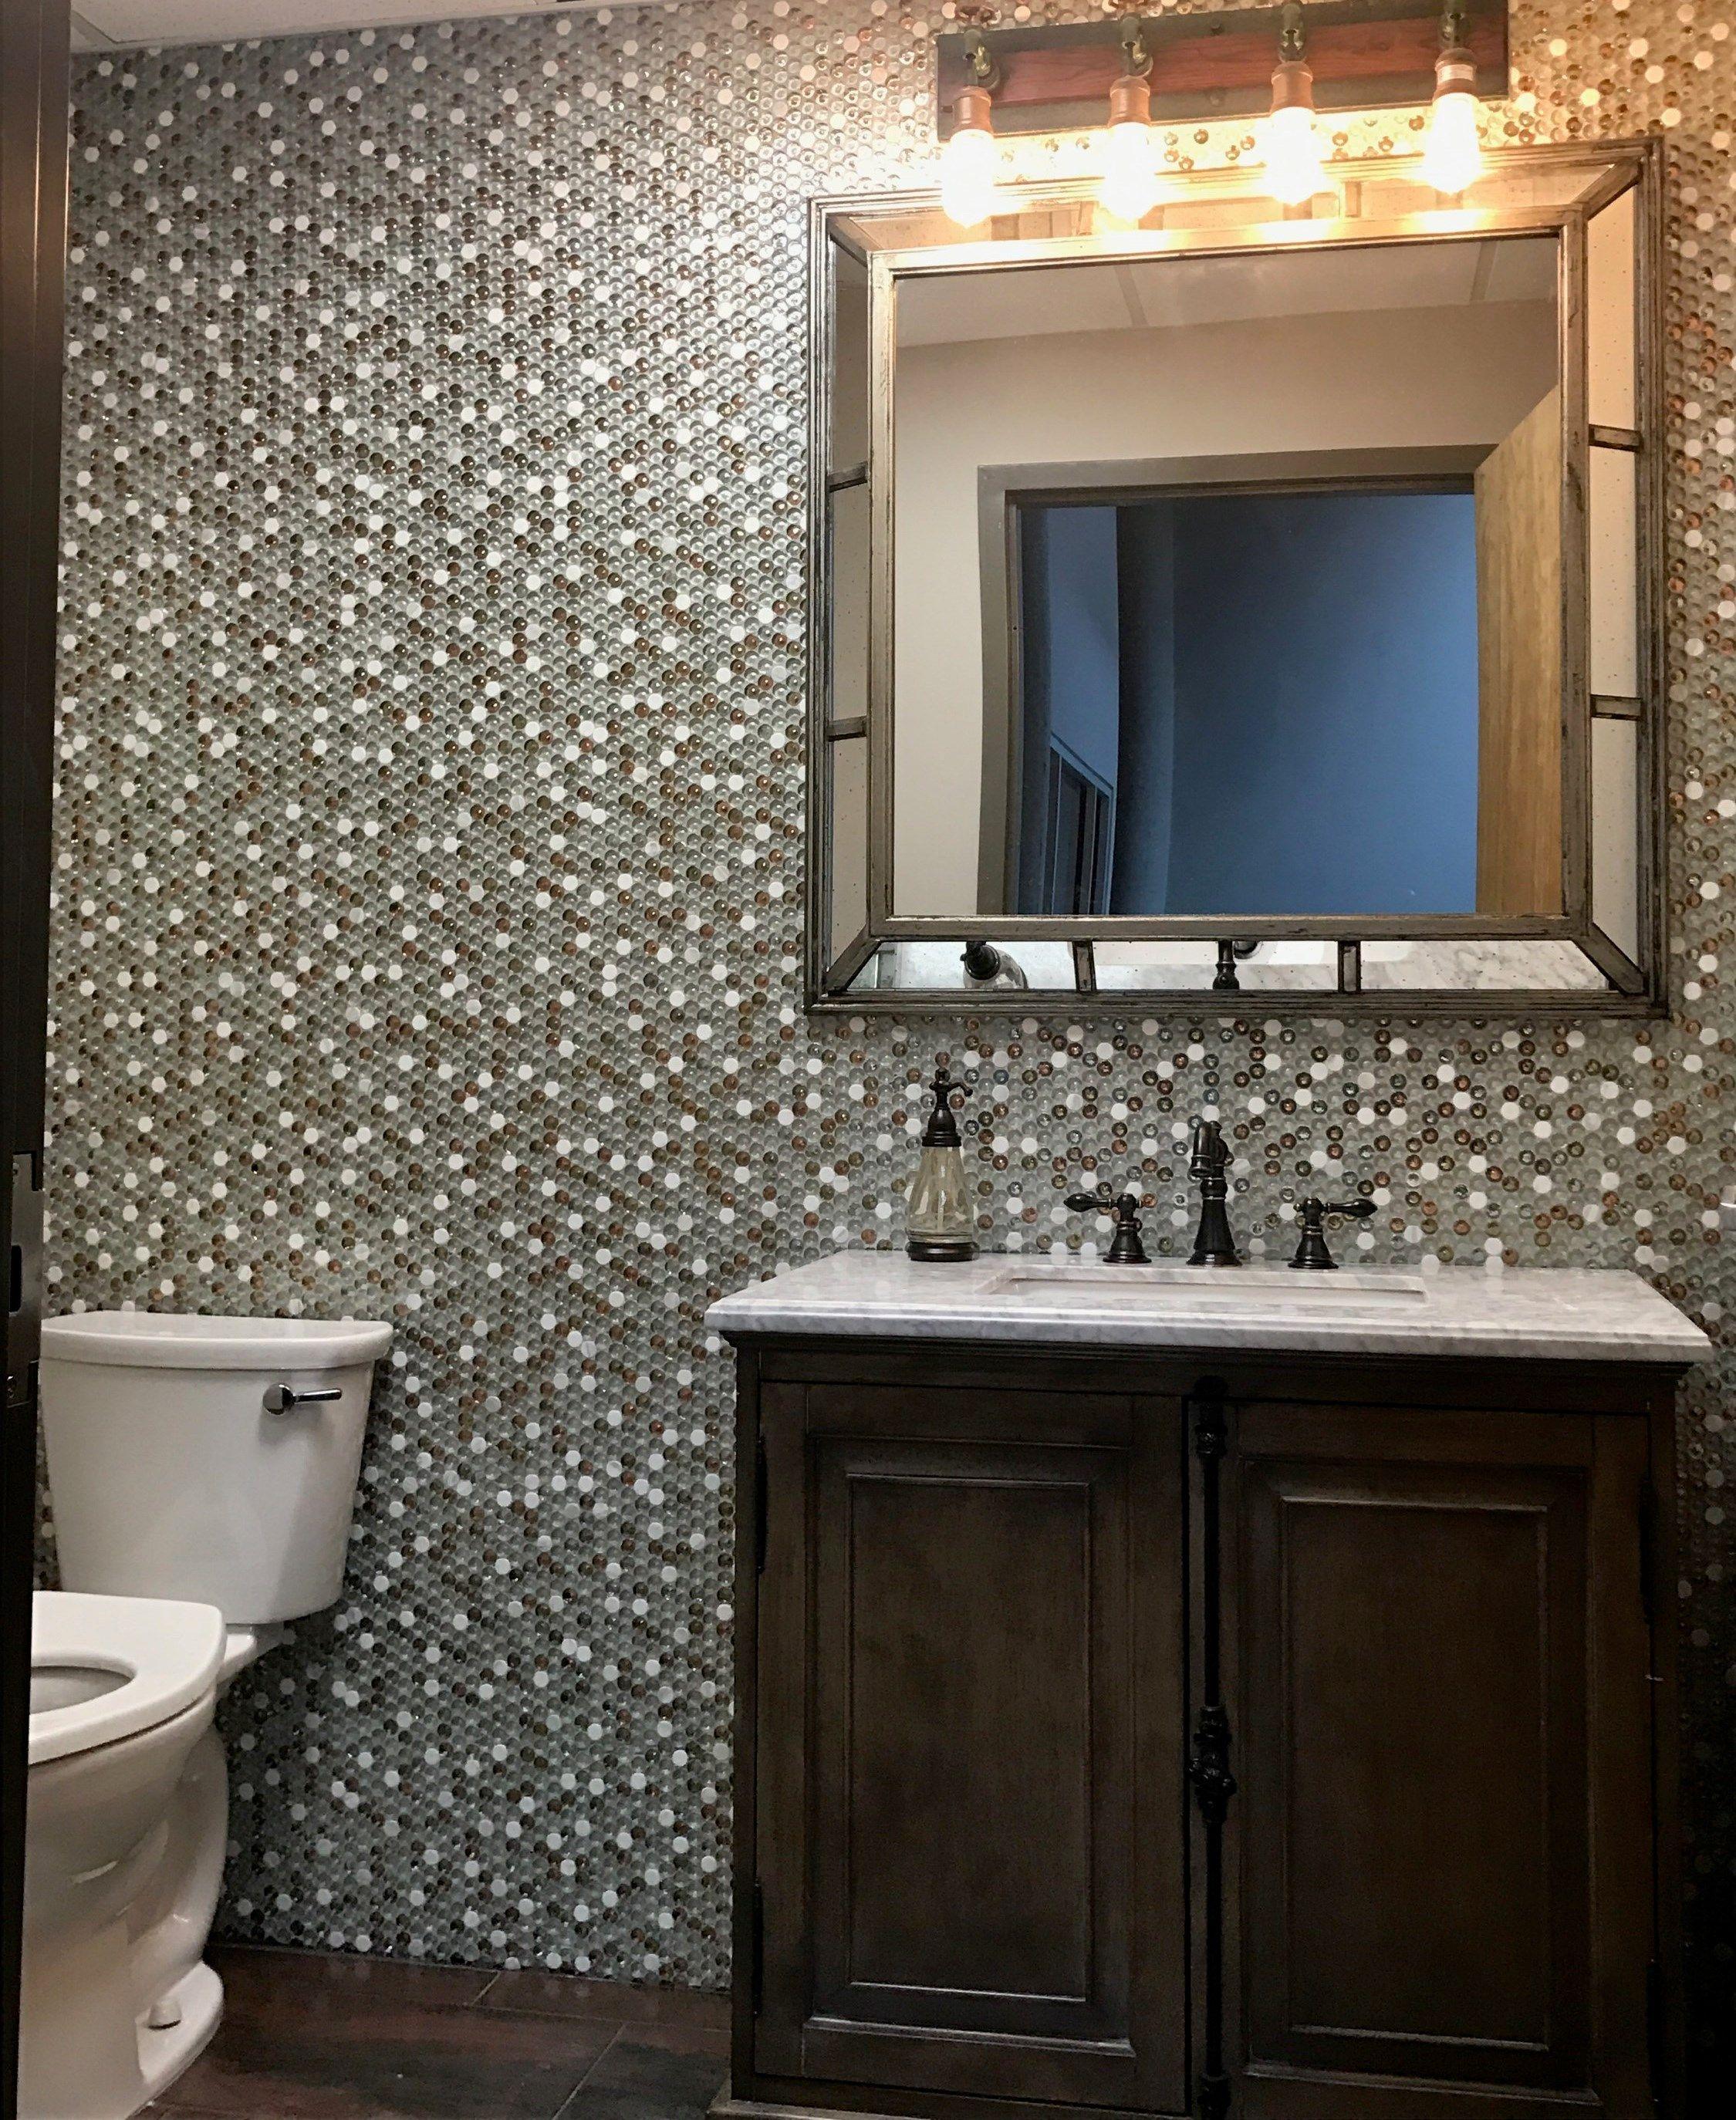 BeElegant Mosaic tile designs, Custom mosaic tile, Tile